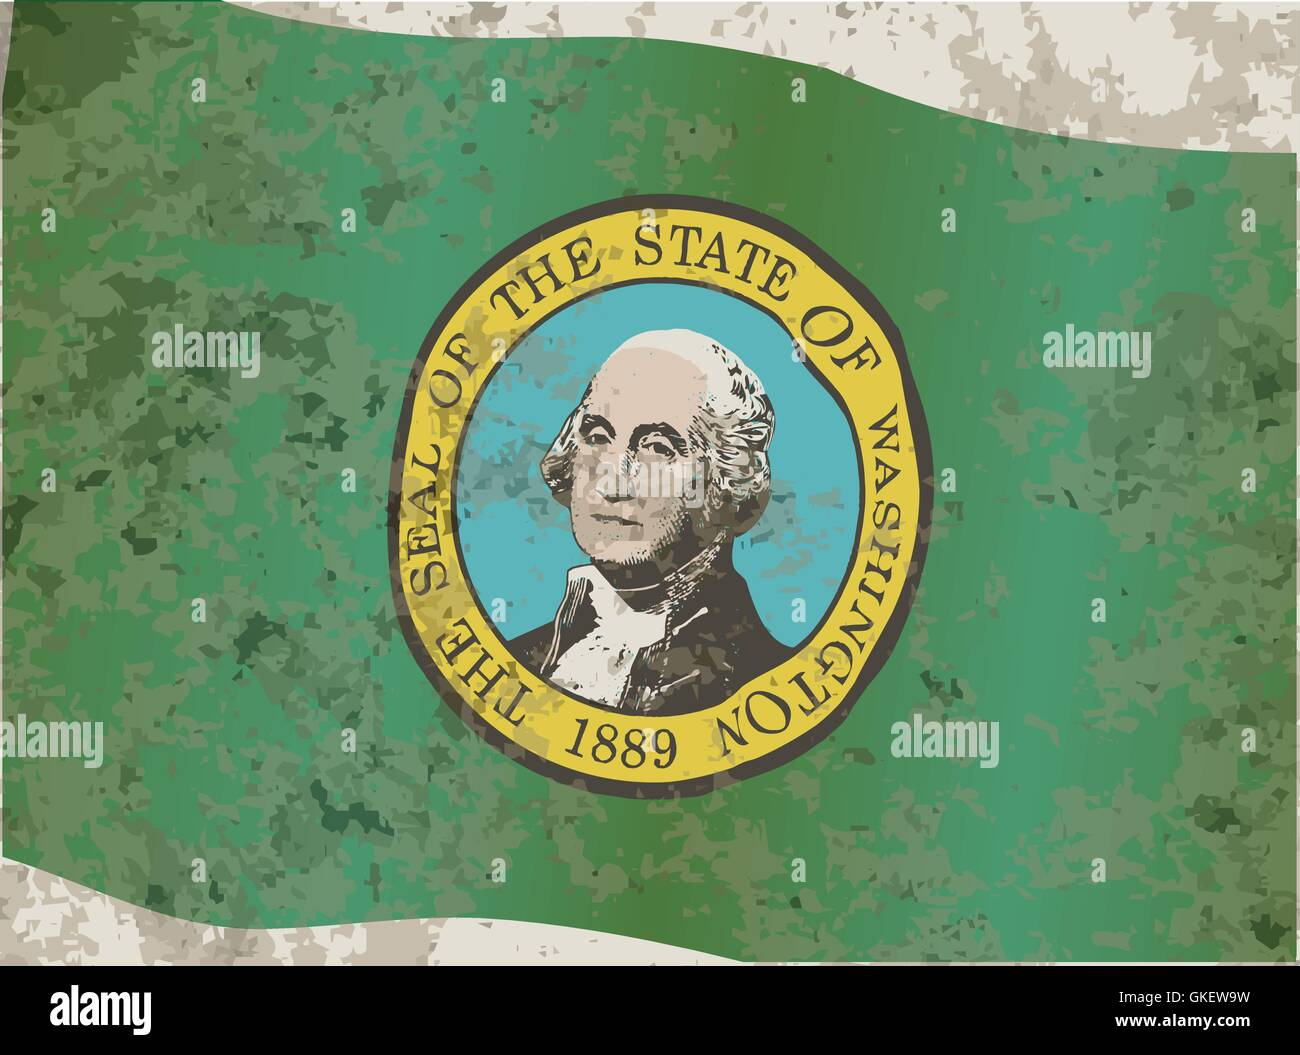 Flag of Washington State - Stock Vector